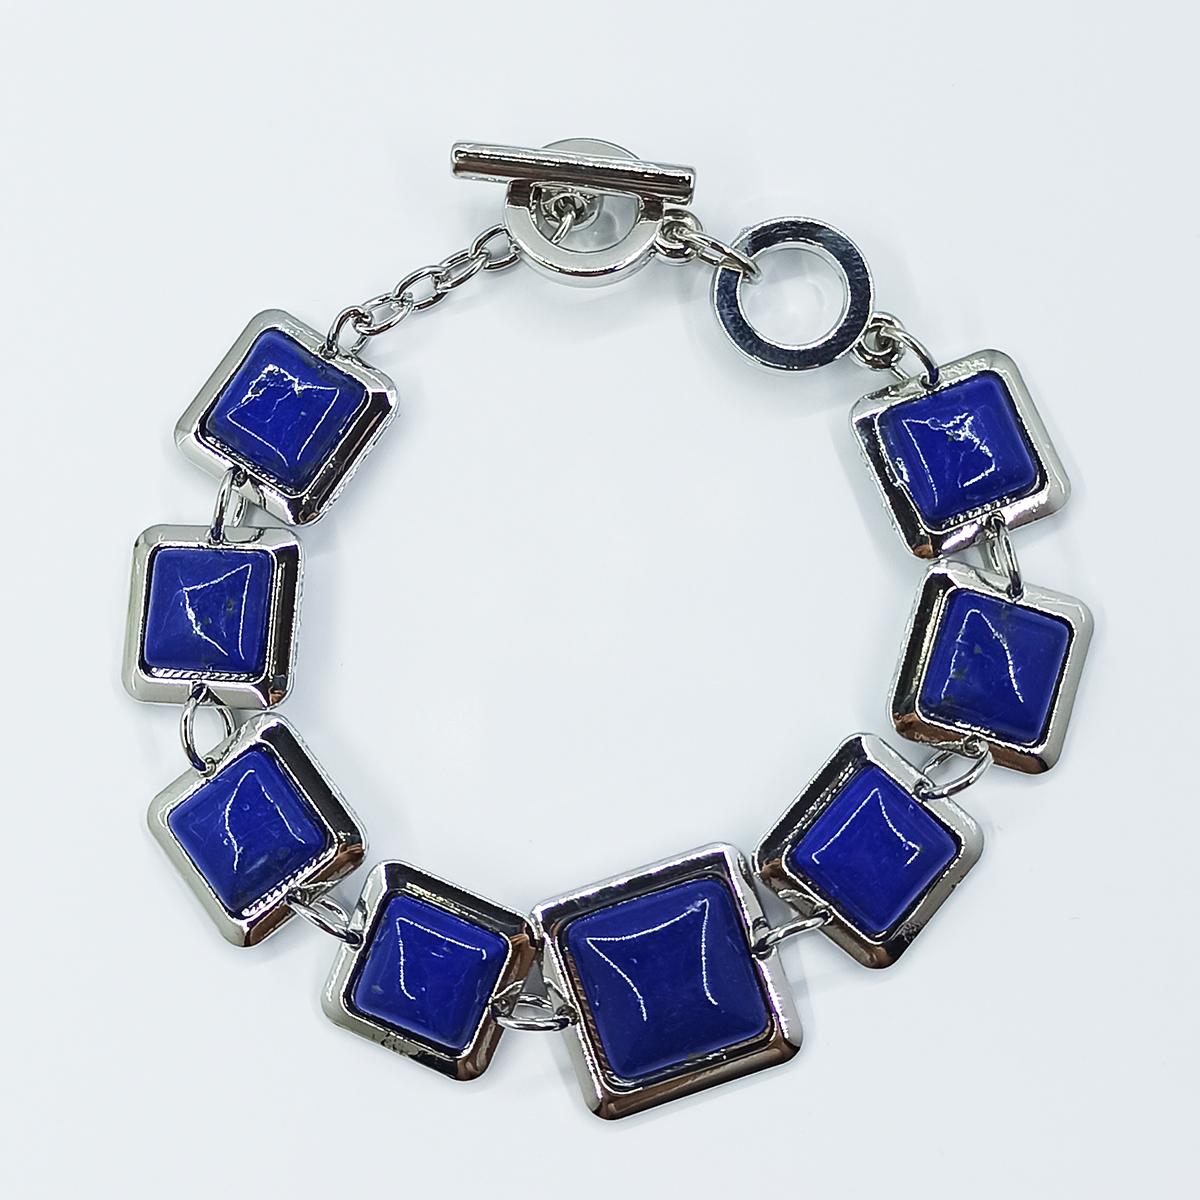 دستبند زنانه سلین کالا مدل لاجورد کد ce-As32